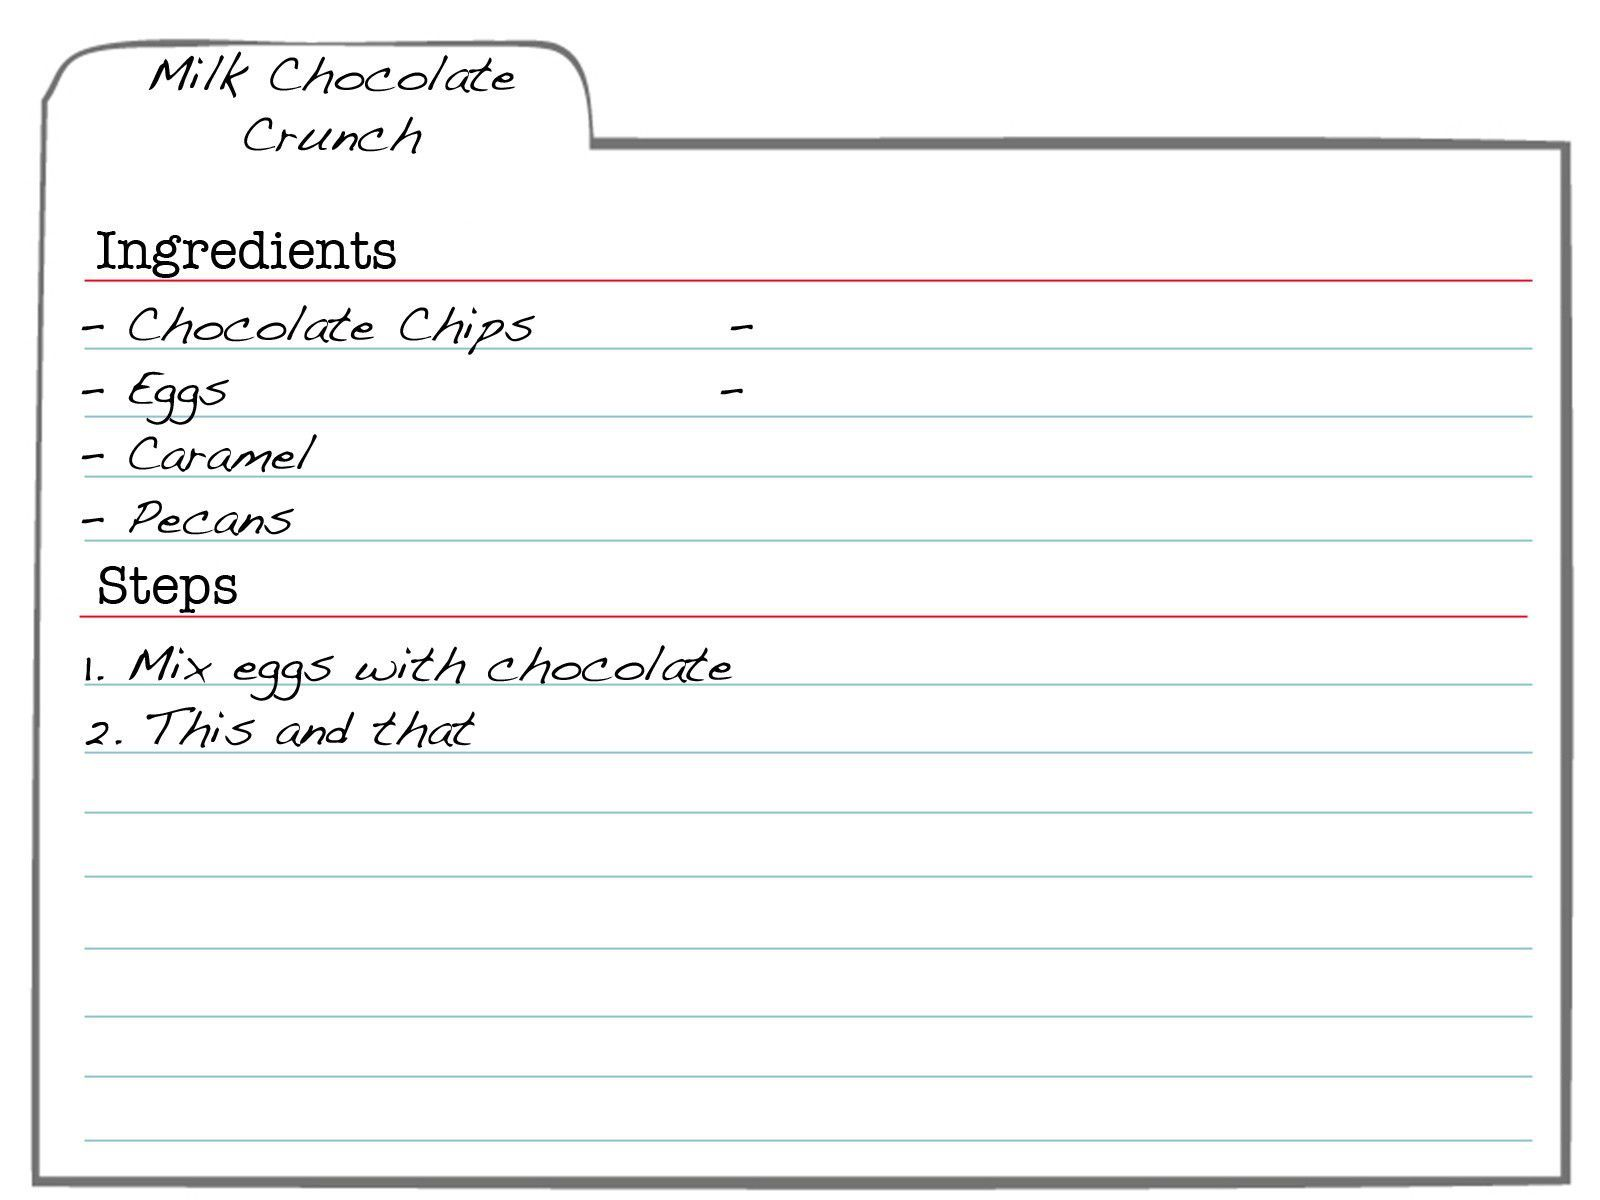 007 Formidable 3 X 5 Recipe Card Template Microsoft Word Idea Full